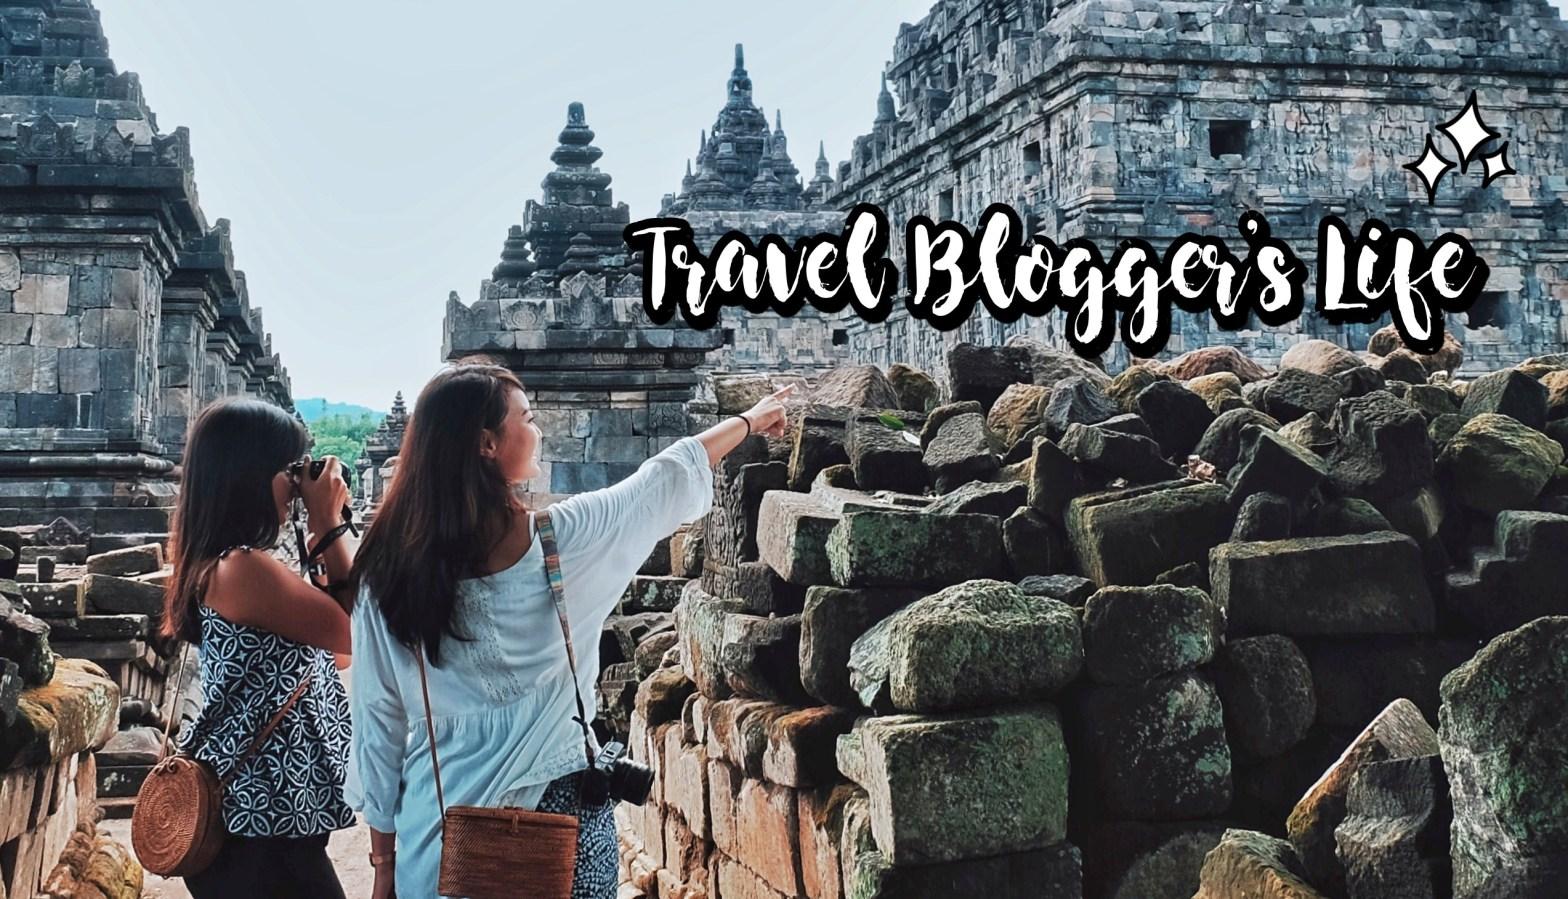 indonesian travel blogger